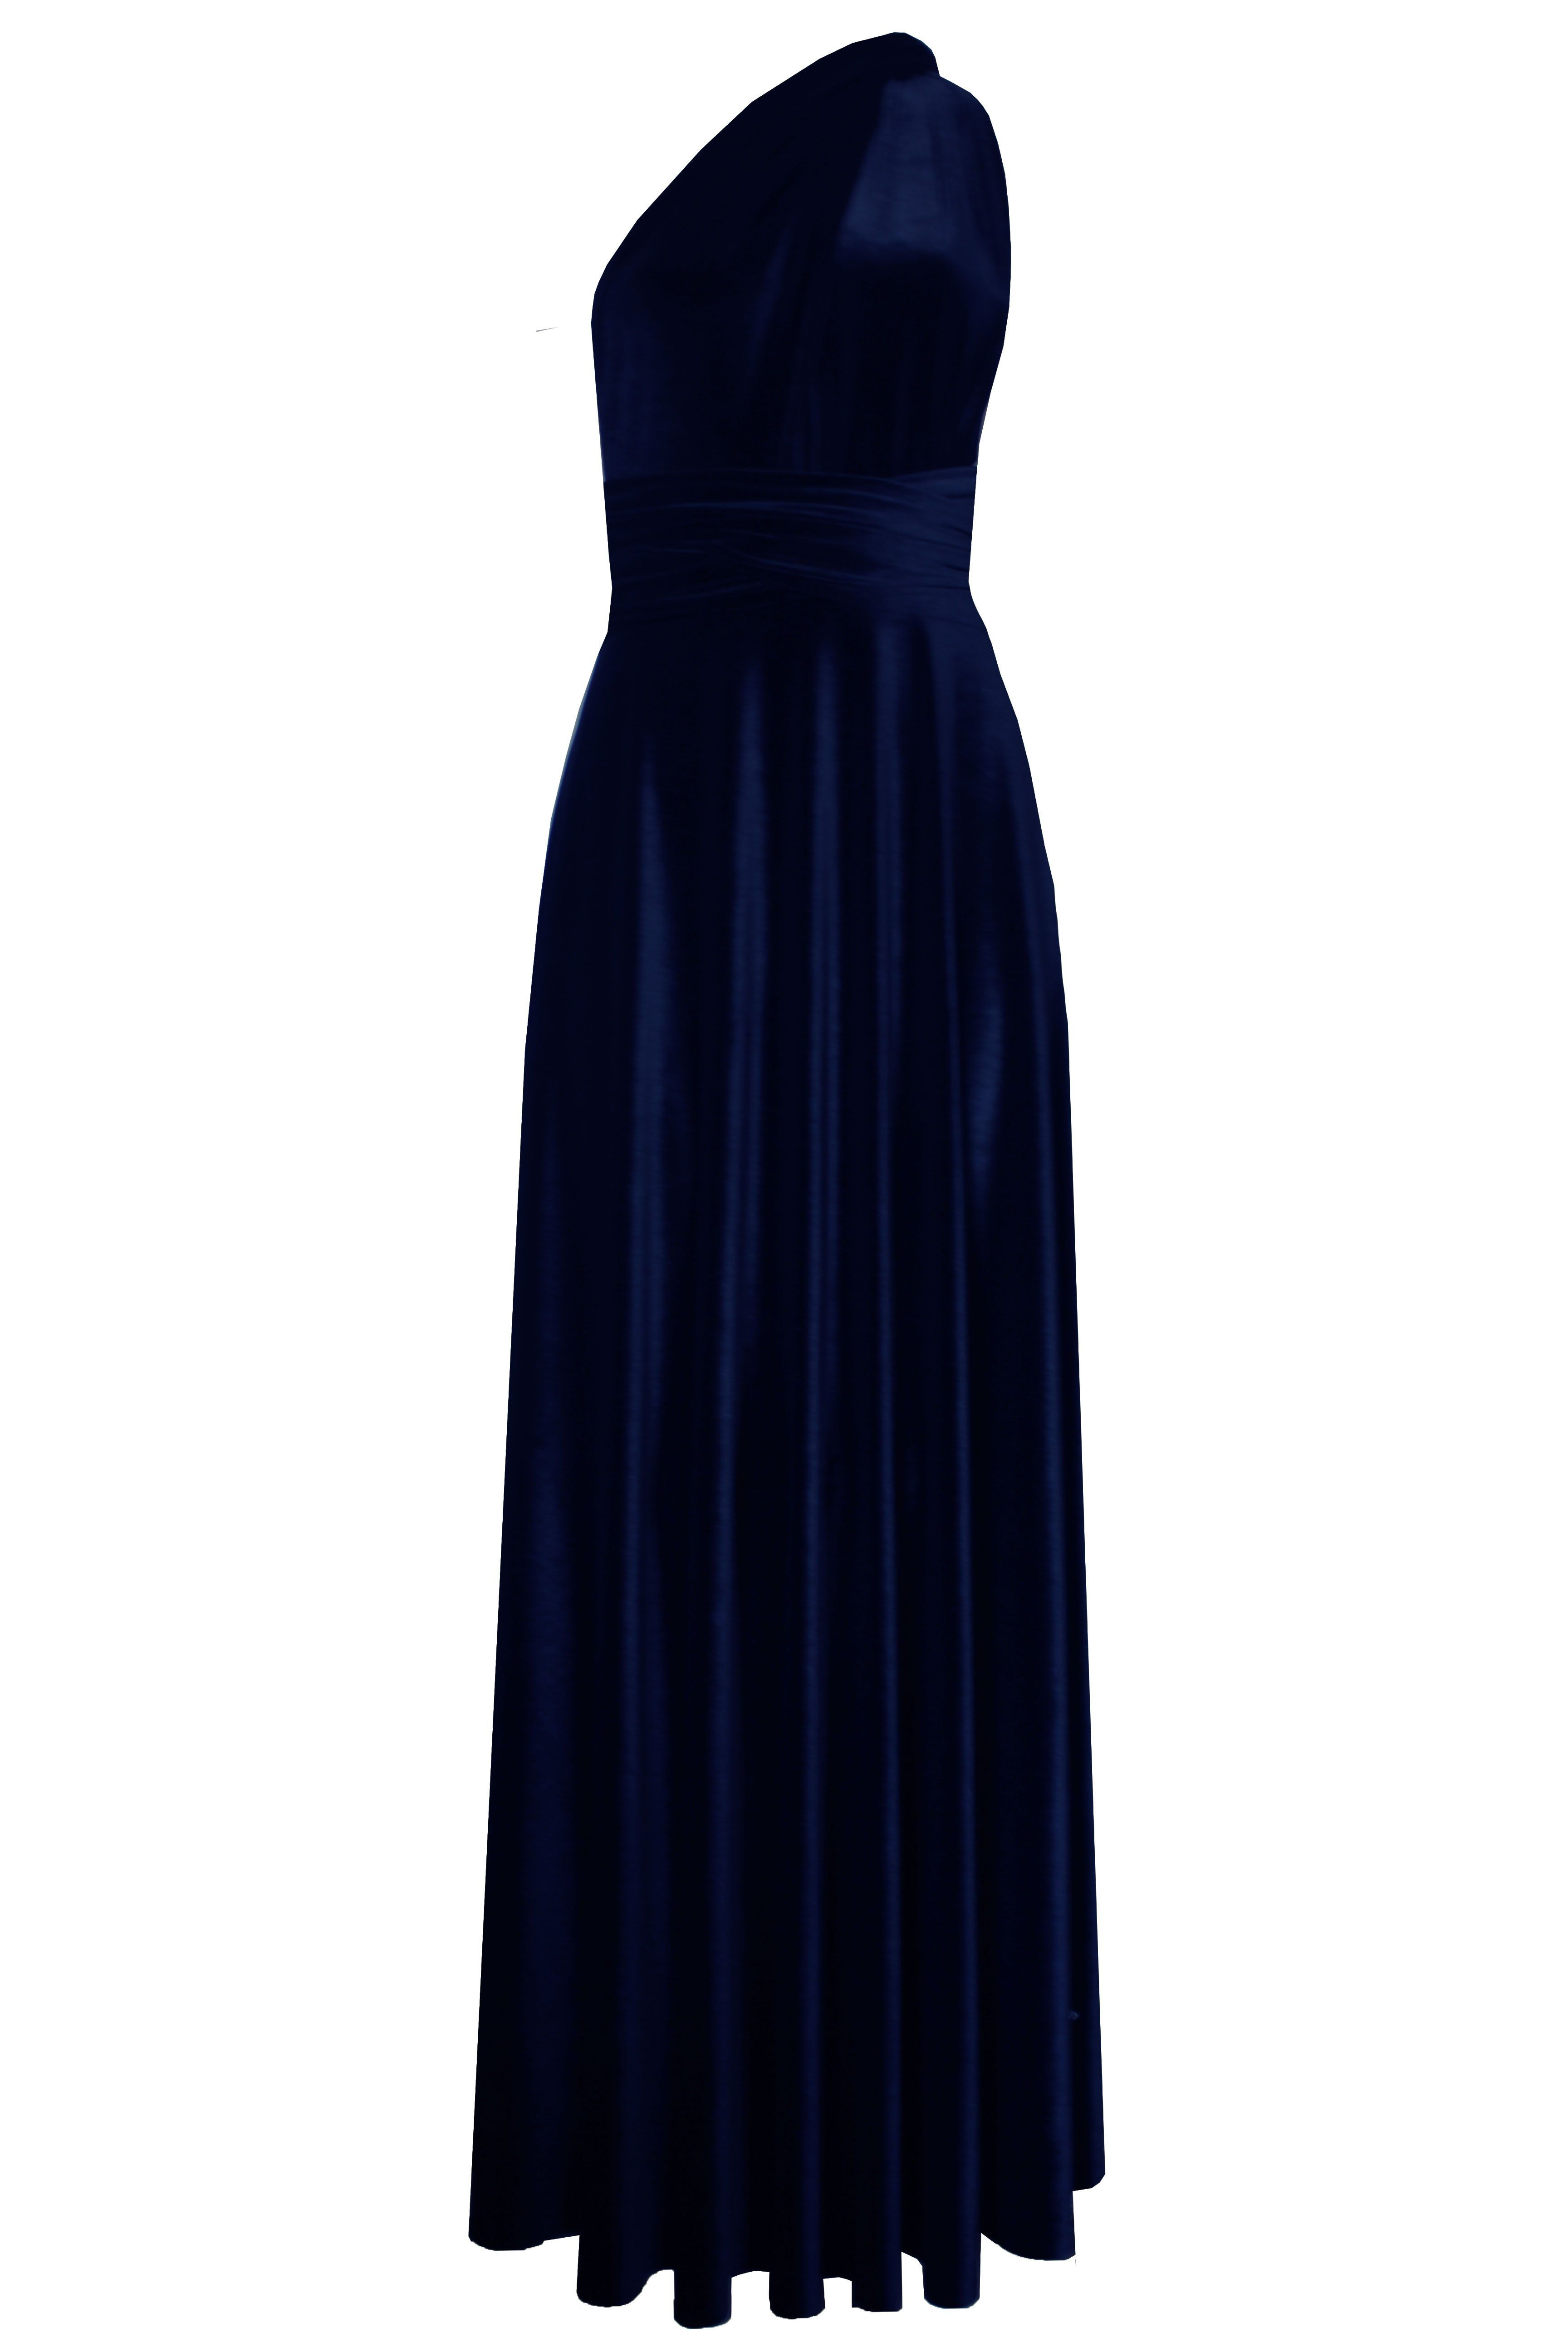 caed2df298f4 EK - Convertible velvet dress Bridesmaids infinity dress Navy blue multi  wrap dress Long plus size prom gown Formal maternity dress XS-5XL